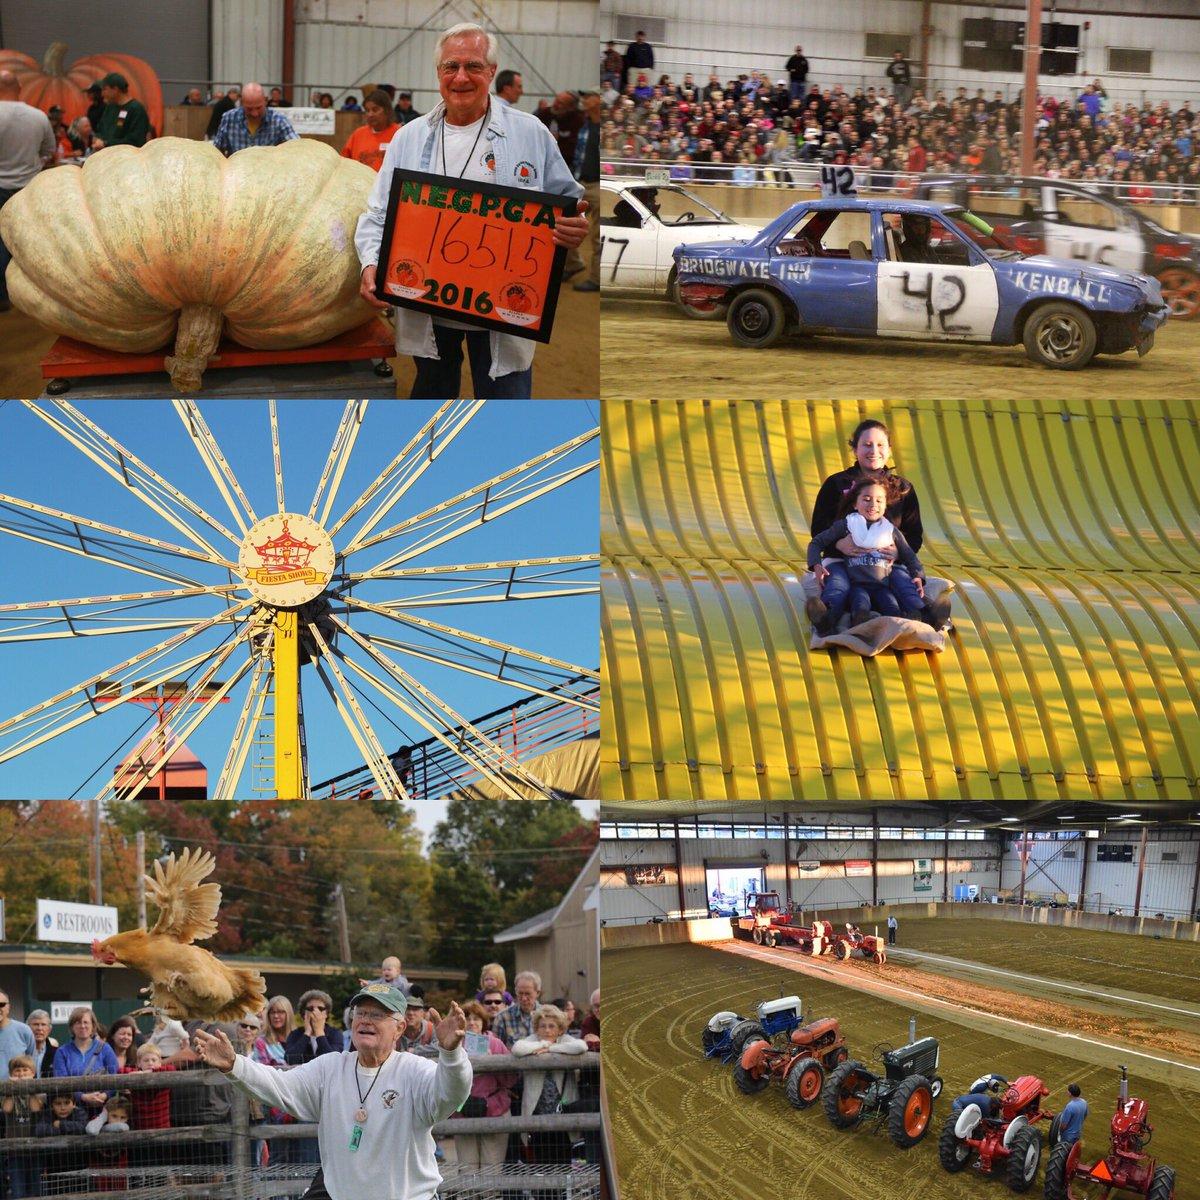 Topsfield Fair 2020.Topsfield Fair On Twitter Under 200 Days Till This Year S